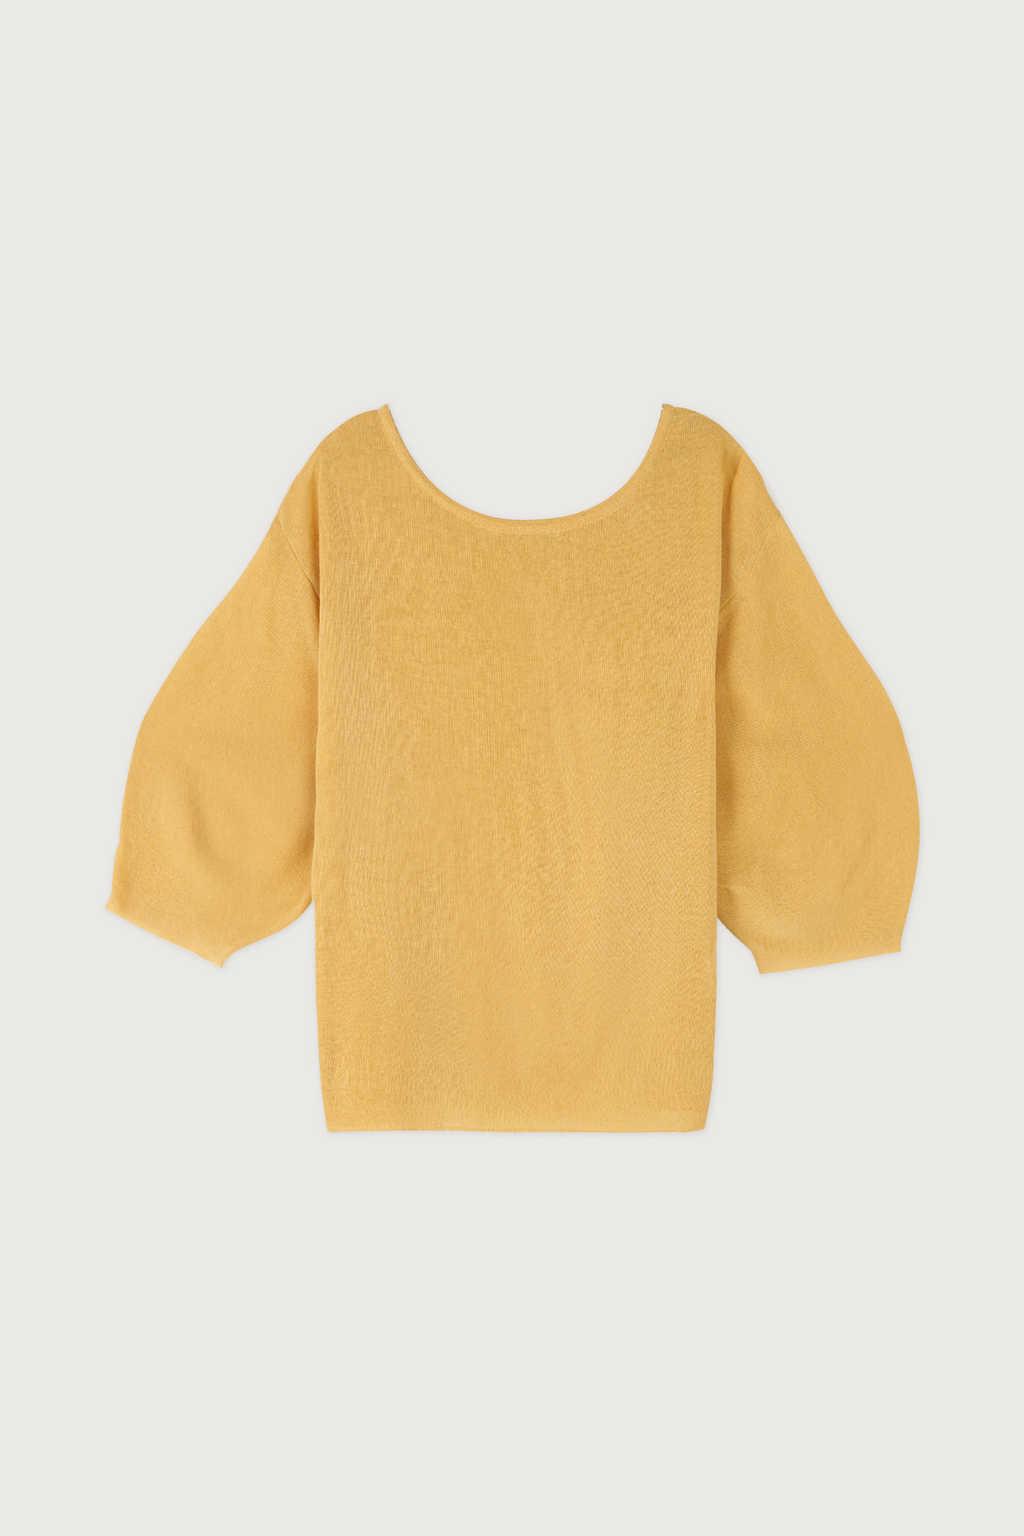 TShirt K010 Yellow 6